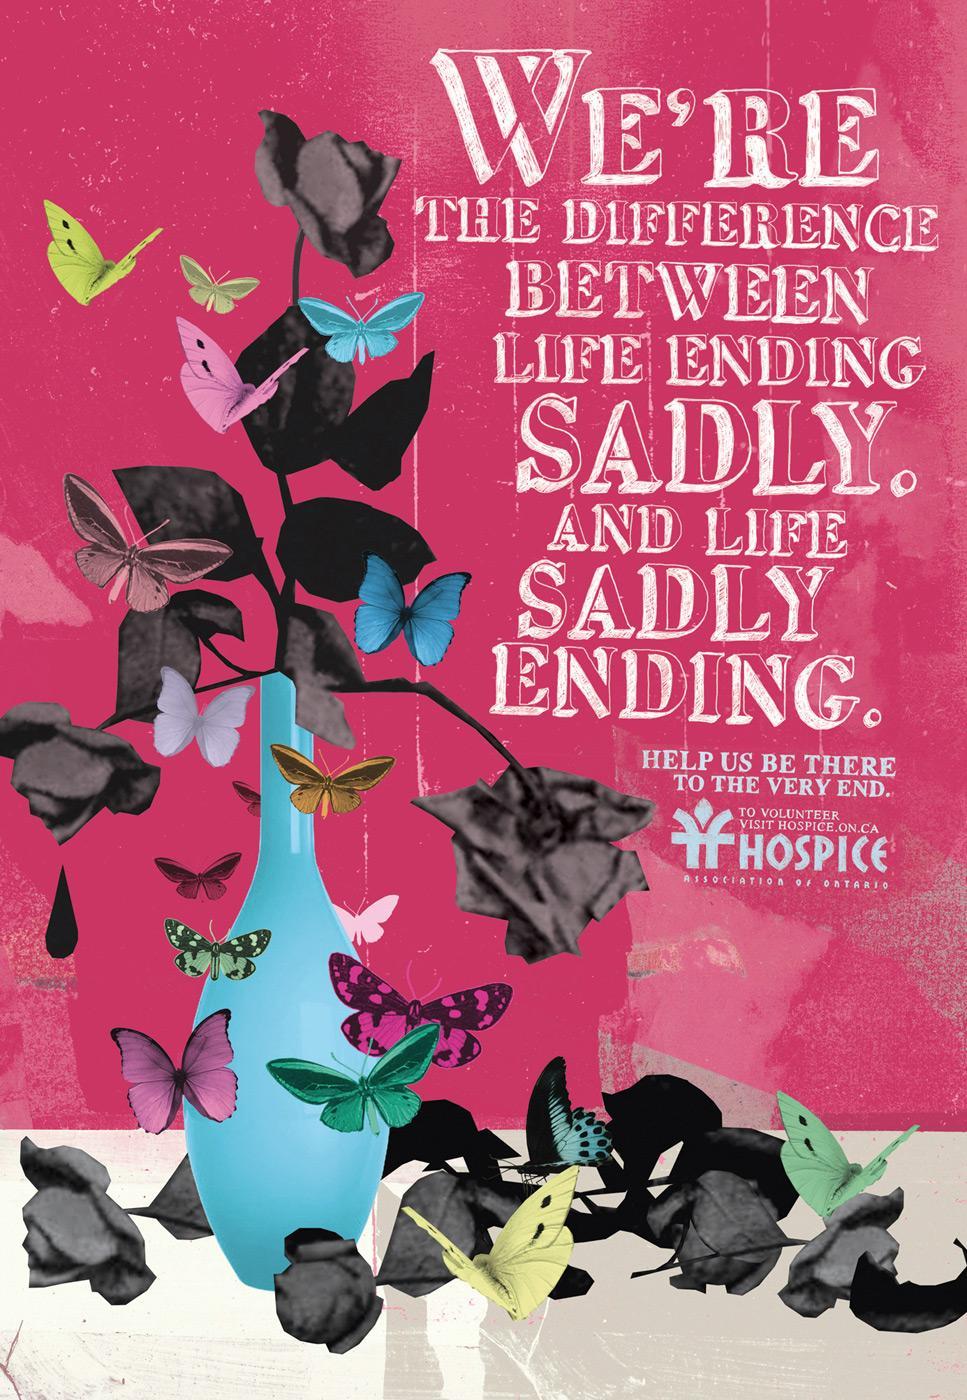 Hospice Print Ad -  Life ending sadly